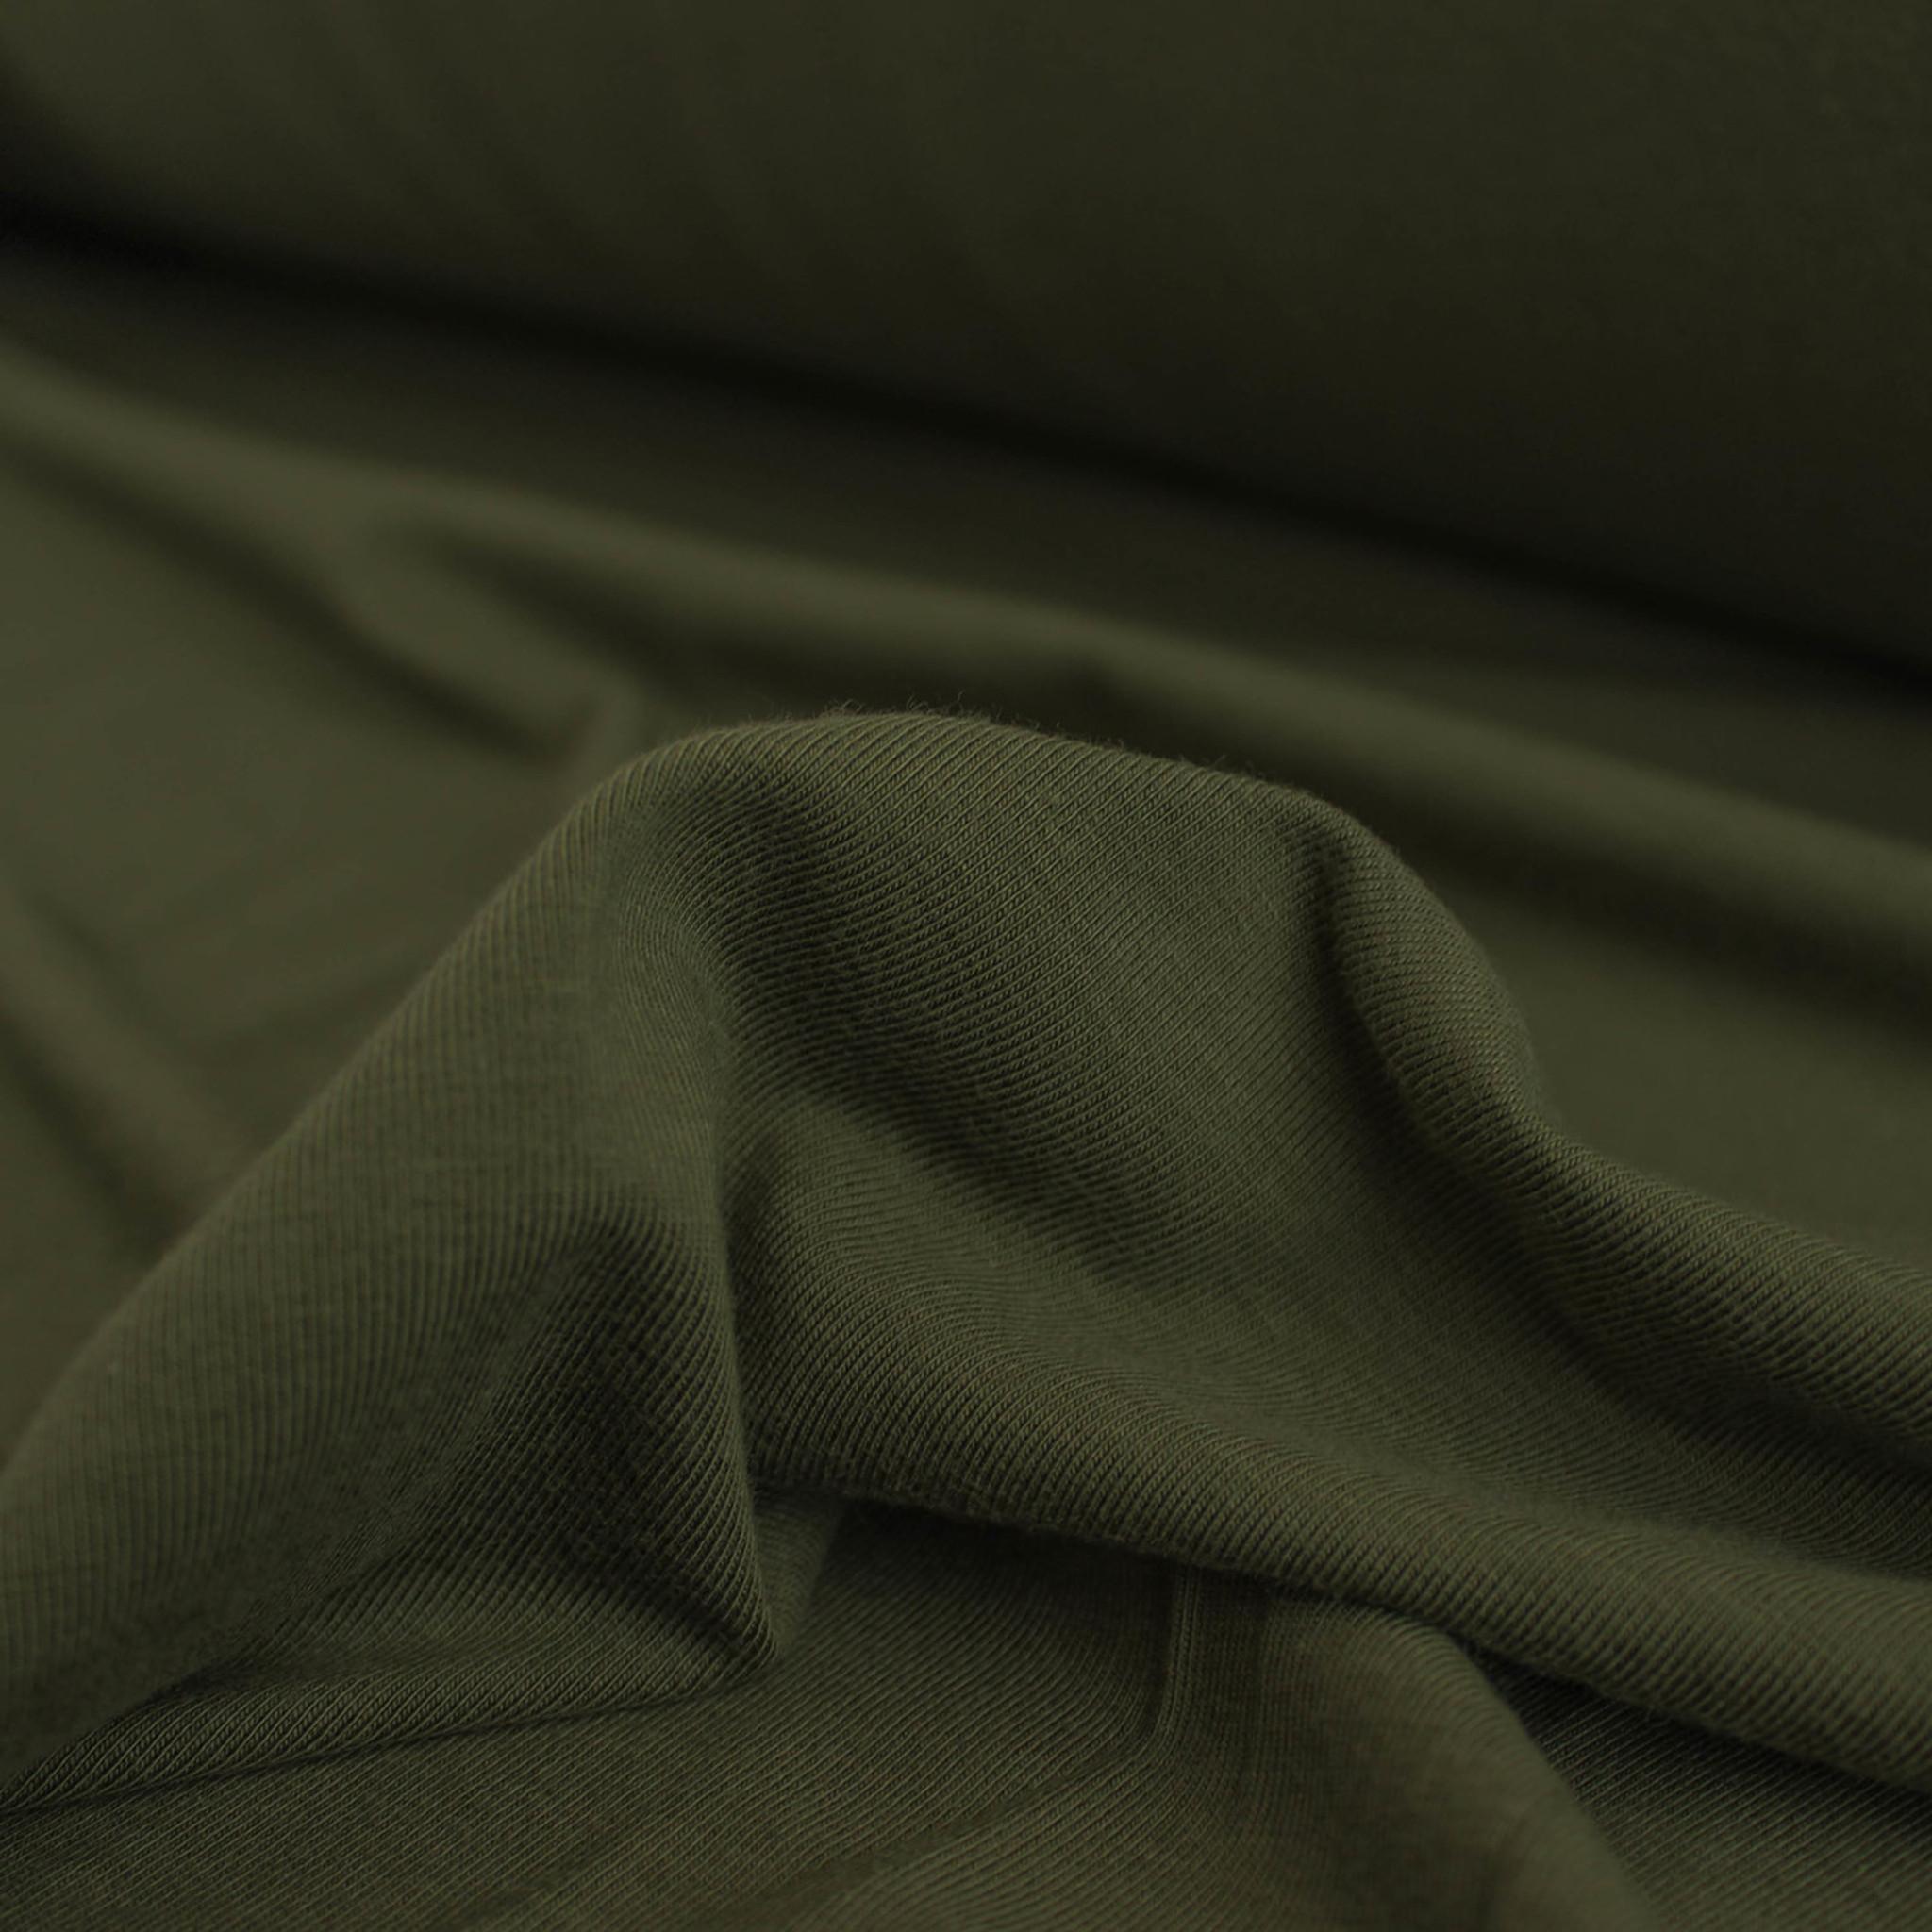 9c0250e3e97 Tencel & Organic Cotton Jersey - Moss   Blackbird Fabrics